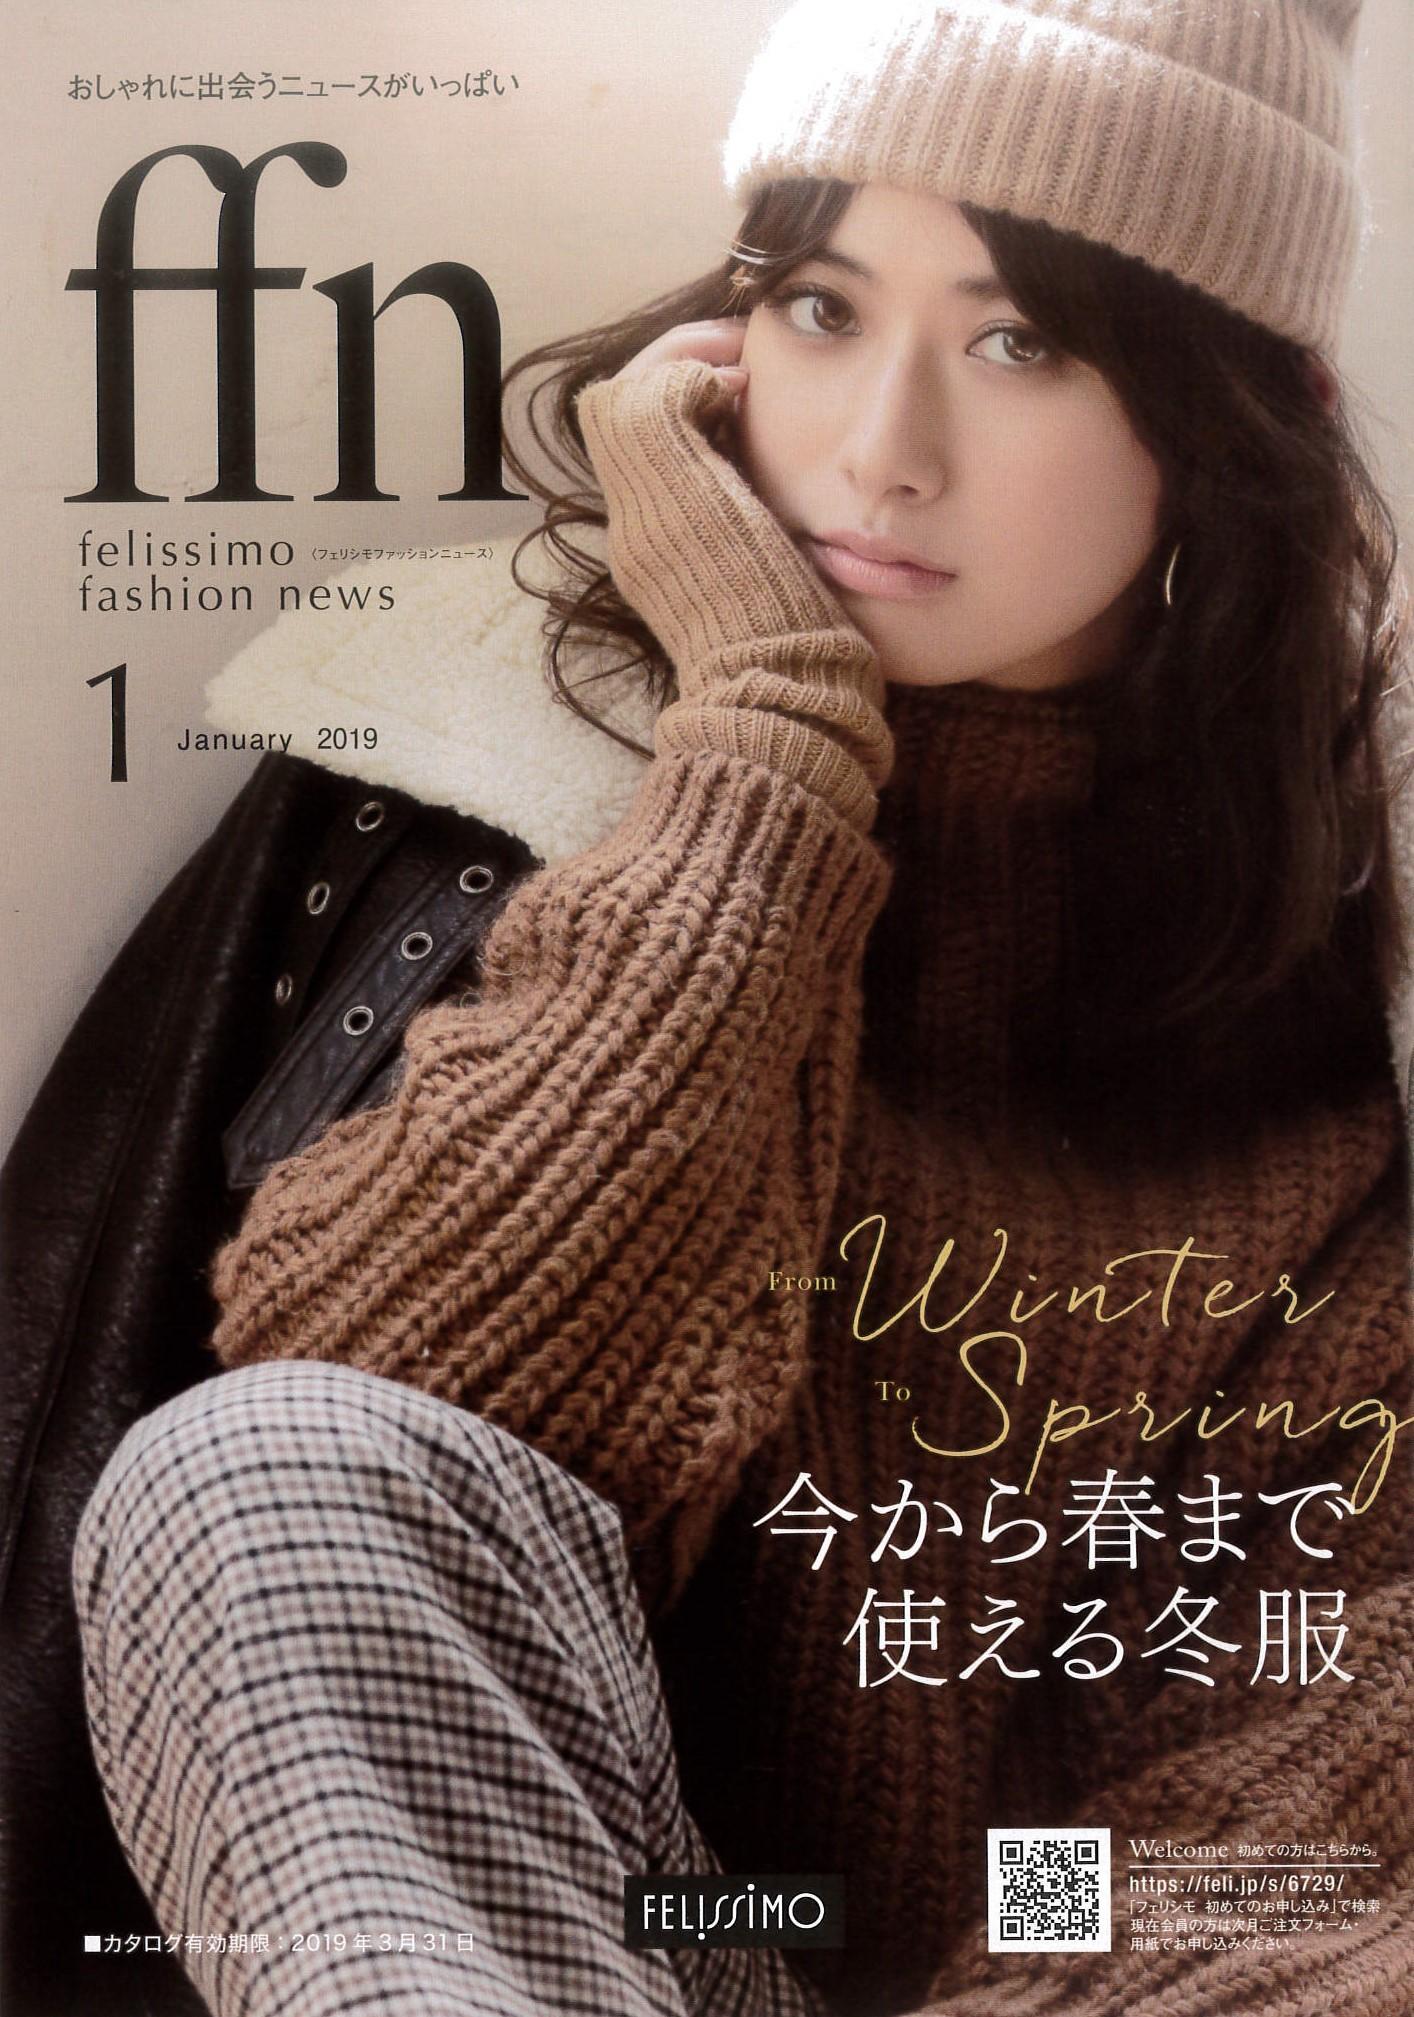 ffn 1月号カバー+中P